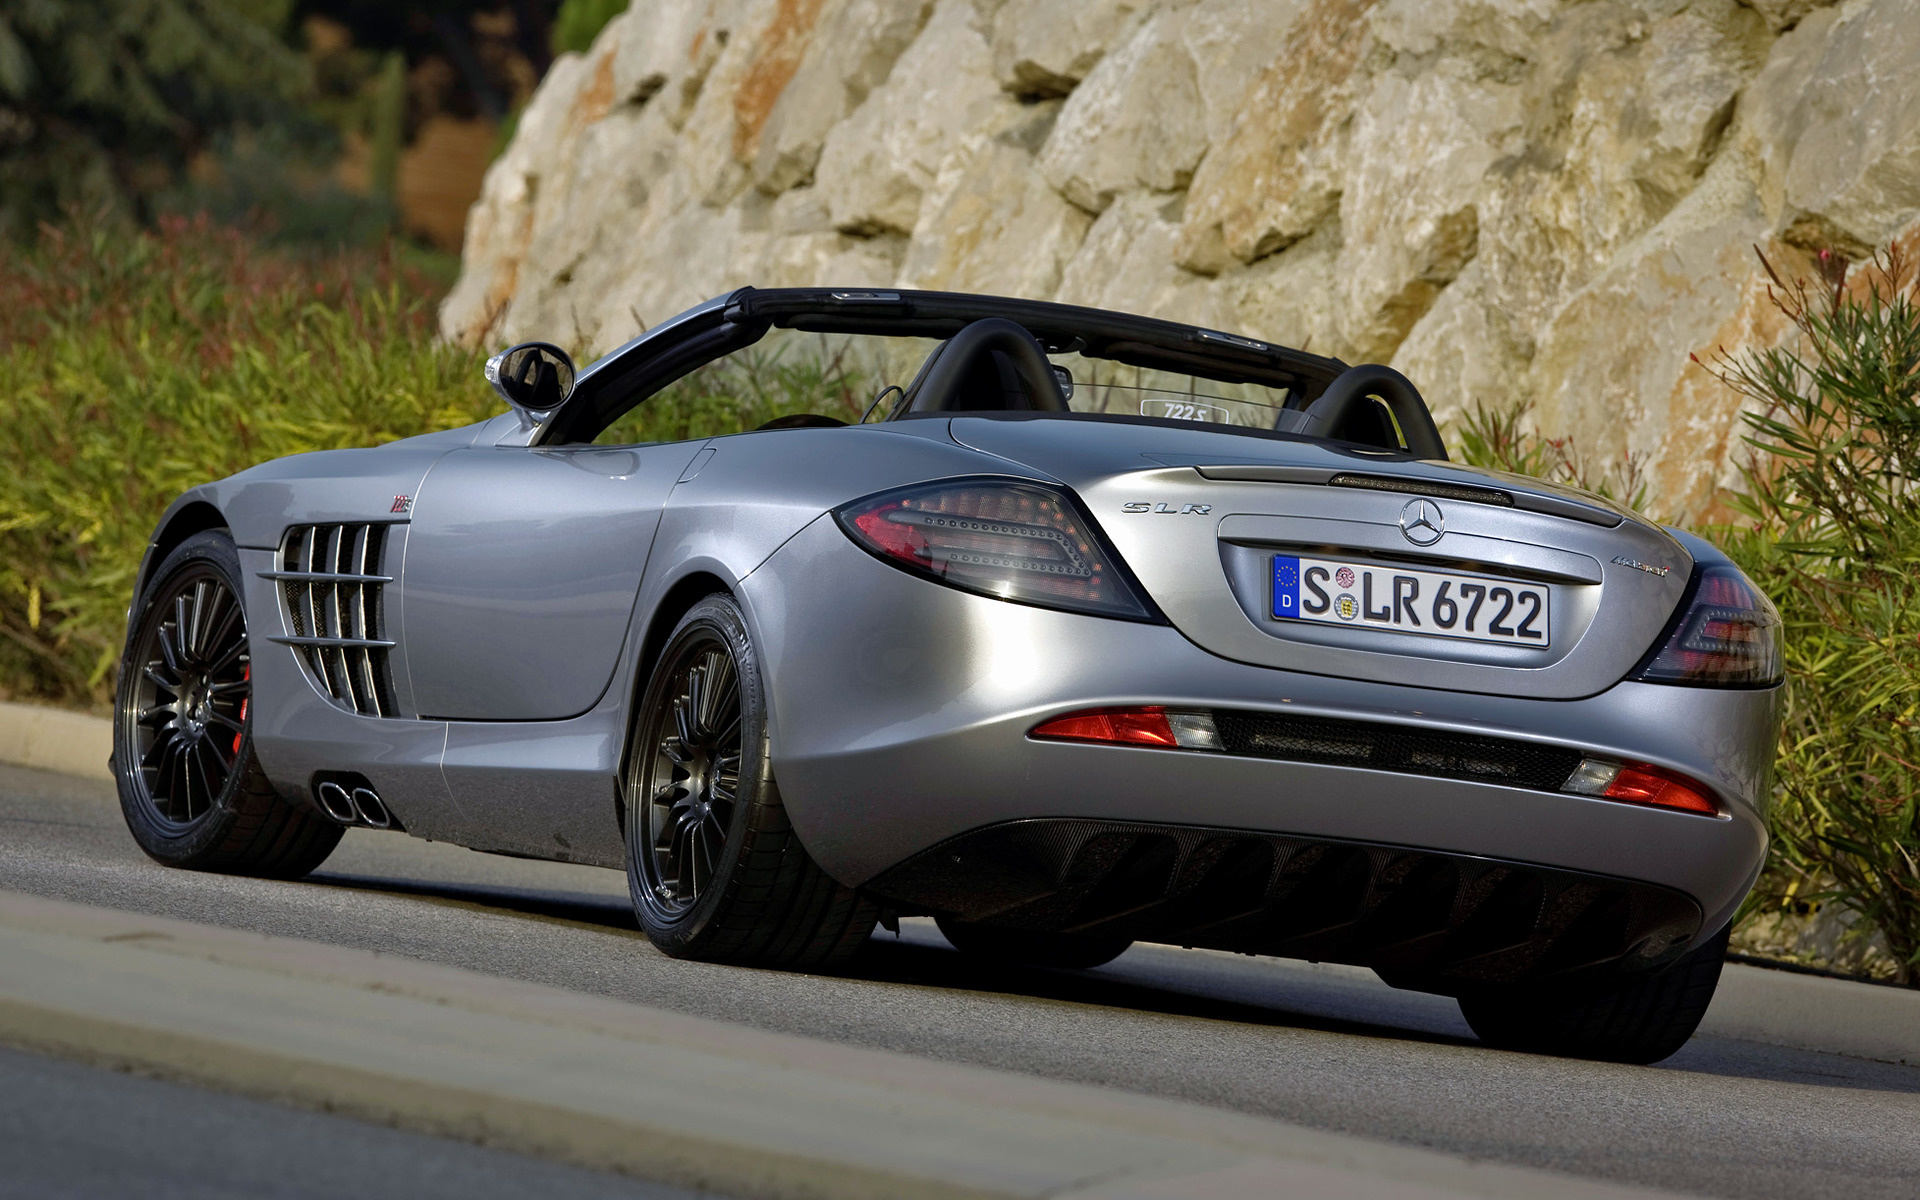 wide 85 slr wallpaper mercedes benz - Mercedes Benz Slr Wallpaper Hd